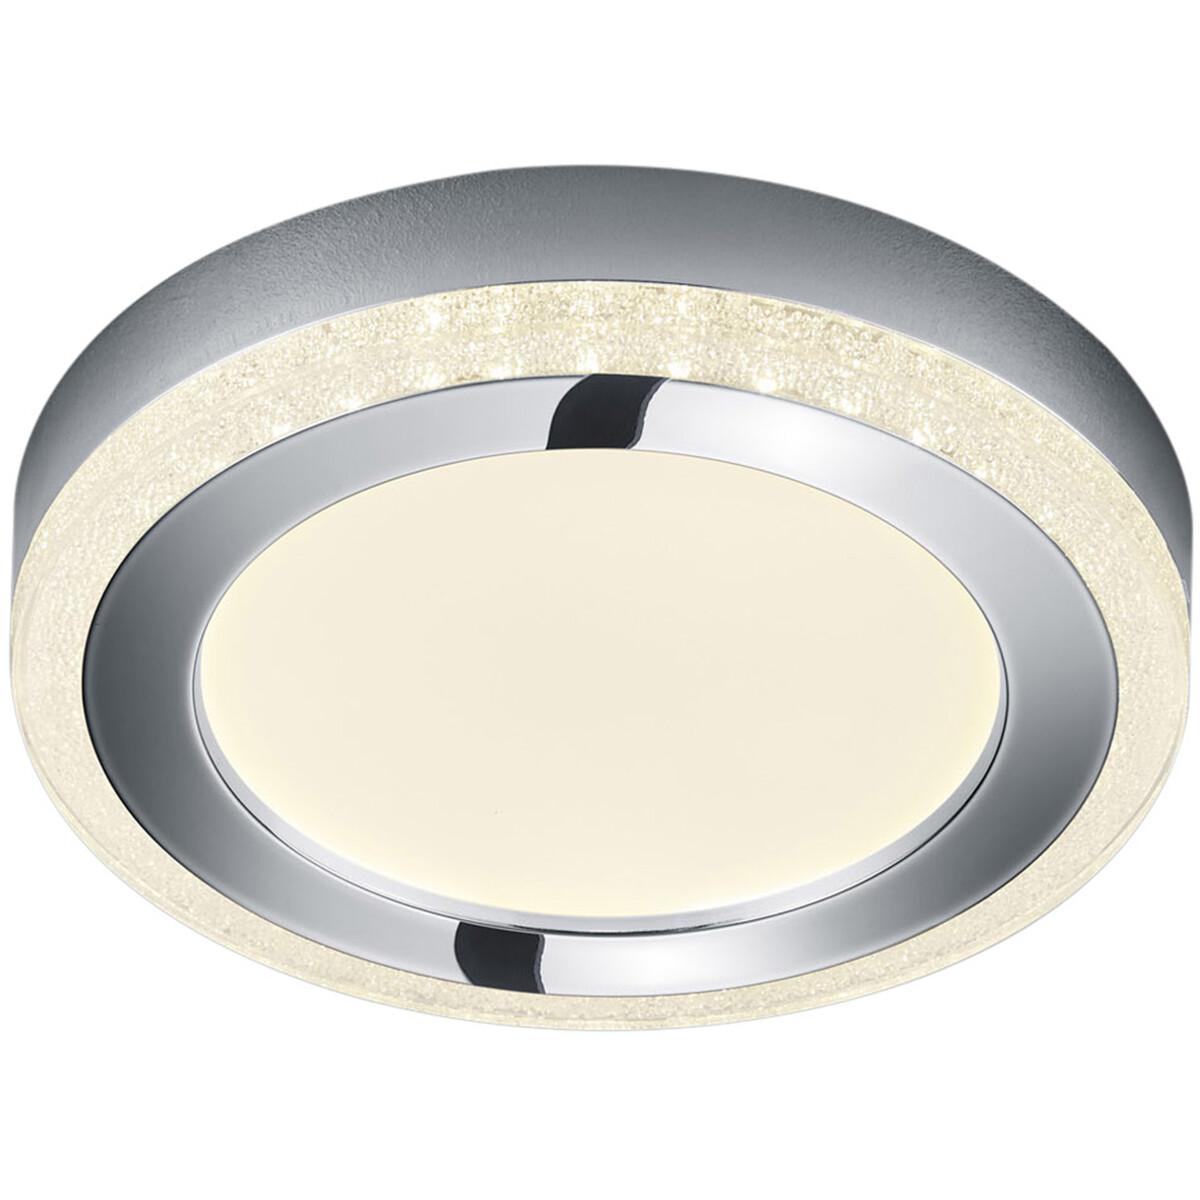 LED Plafondlamp - Plafondverlichting - Trion Slodan - 10W - Aanpasbare Kleur - Rond - Mat Wit - Kuns